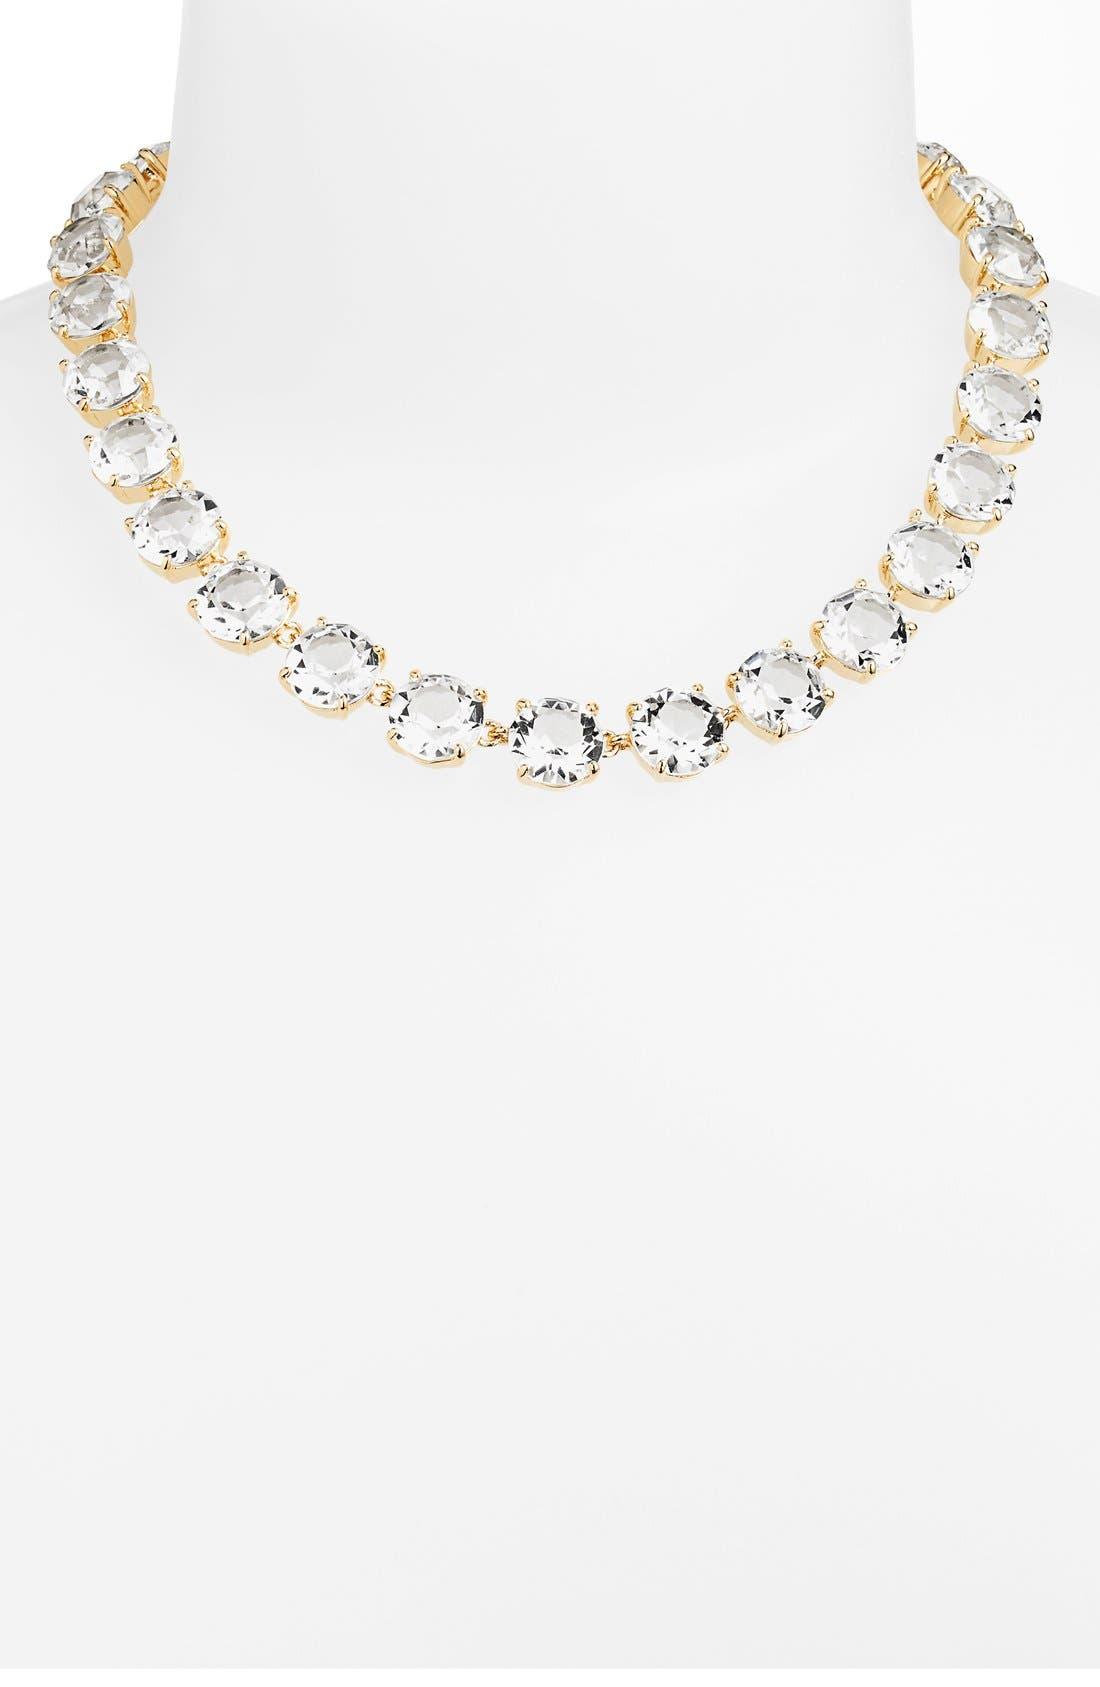 Alternate Image 1 Selected - Lauren Ralph Lauren 'Signature Collection' Crystal Collar Necklace